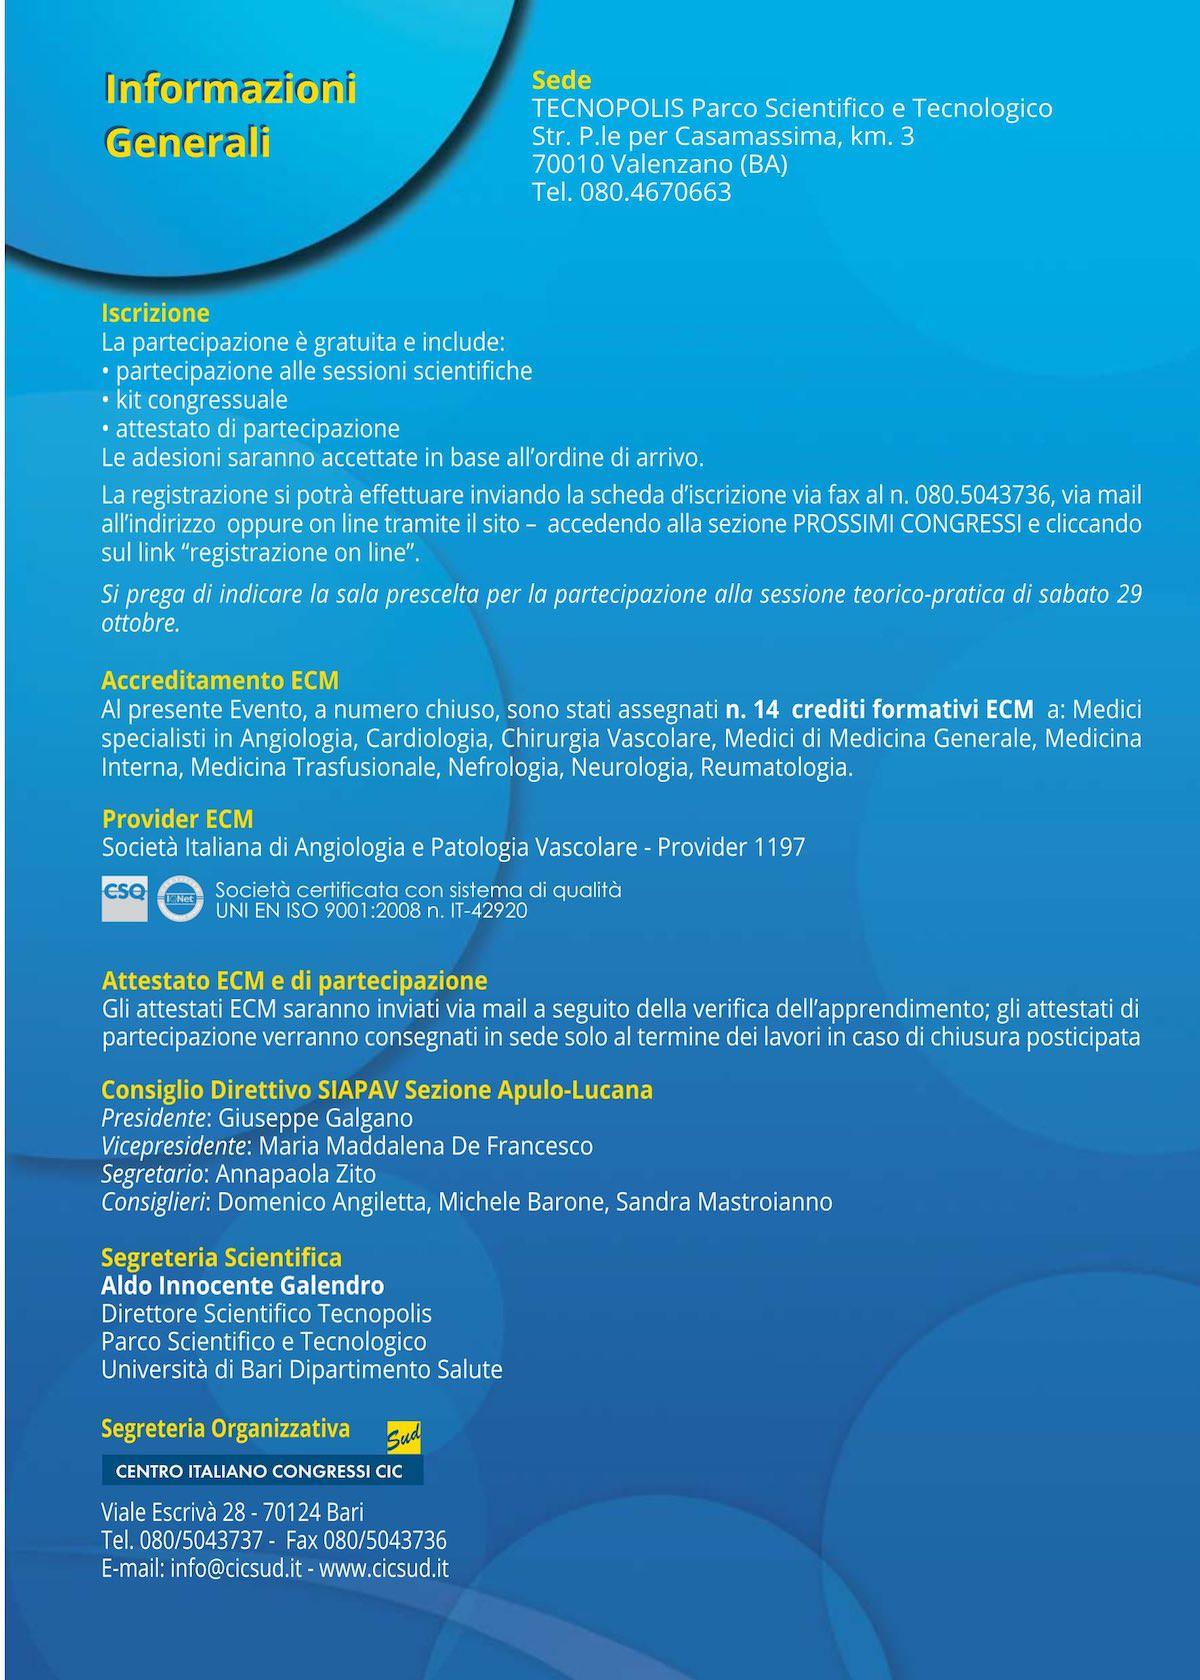 medical-tools-al-convegno-regionale-siapav-diagnosis-management-and-rehabilitation-of-vascular-disease-valenzano-2016-6